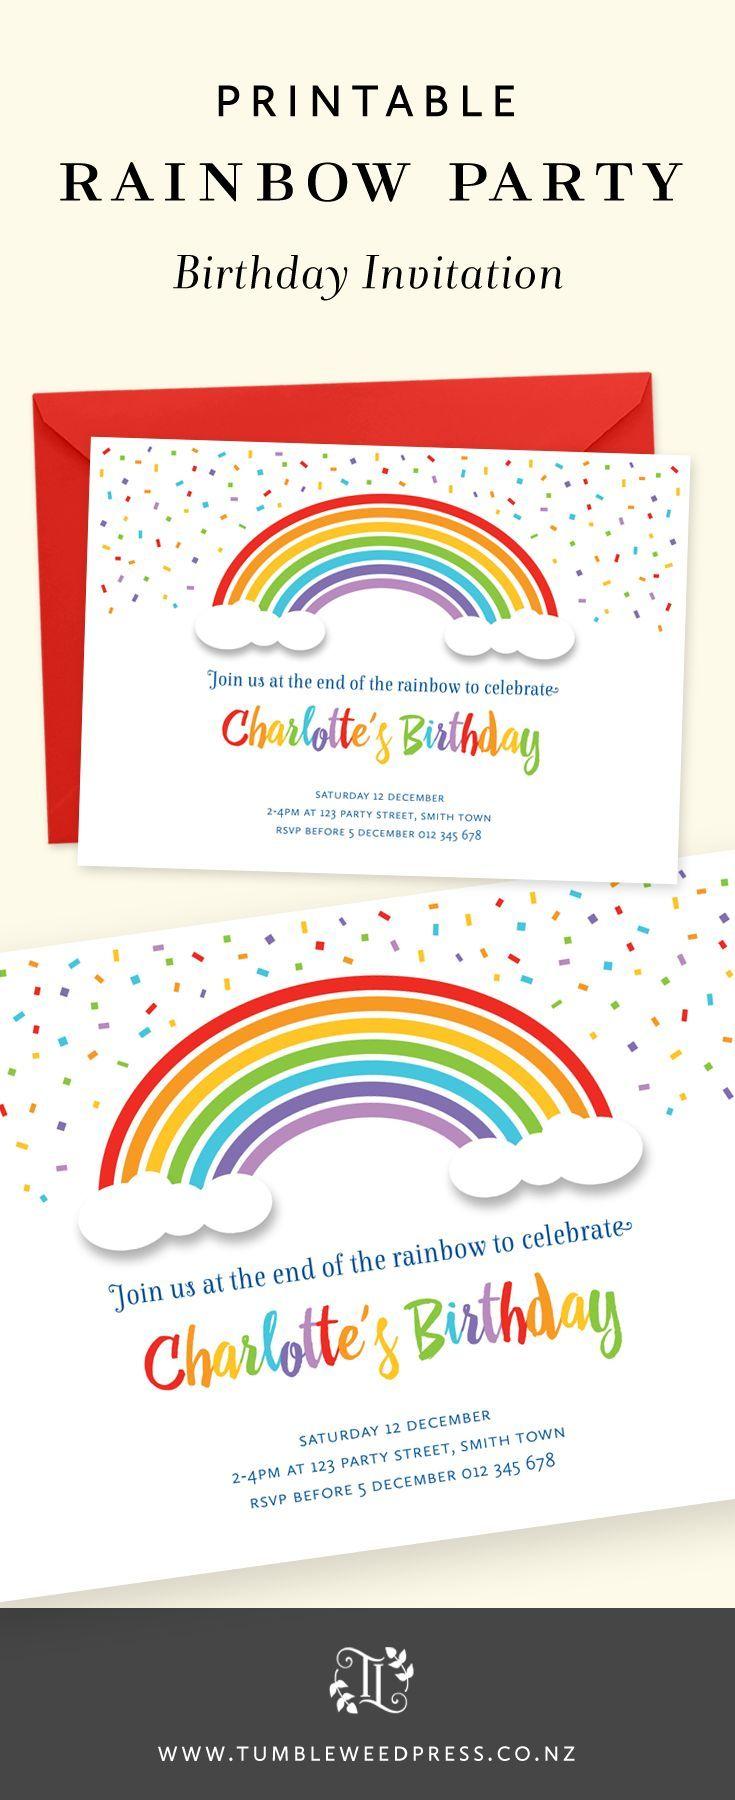 Pin By Camila De Fatima Neves Araujo On Festa Infantil Arco Iria Rainbow Party Invitations Rainbow Birthday Invitations Rainbow Birthday Party